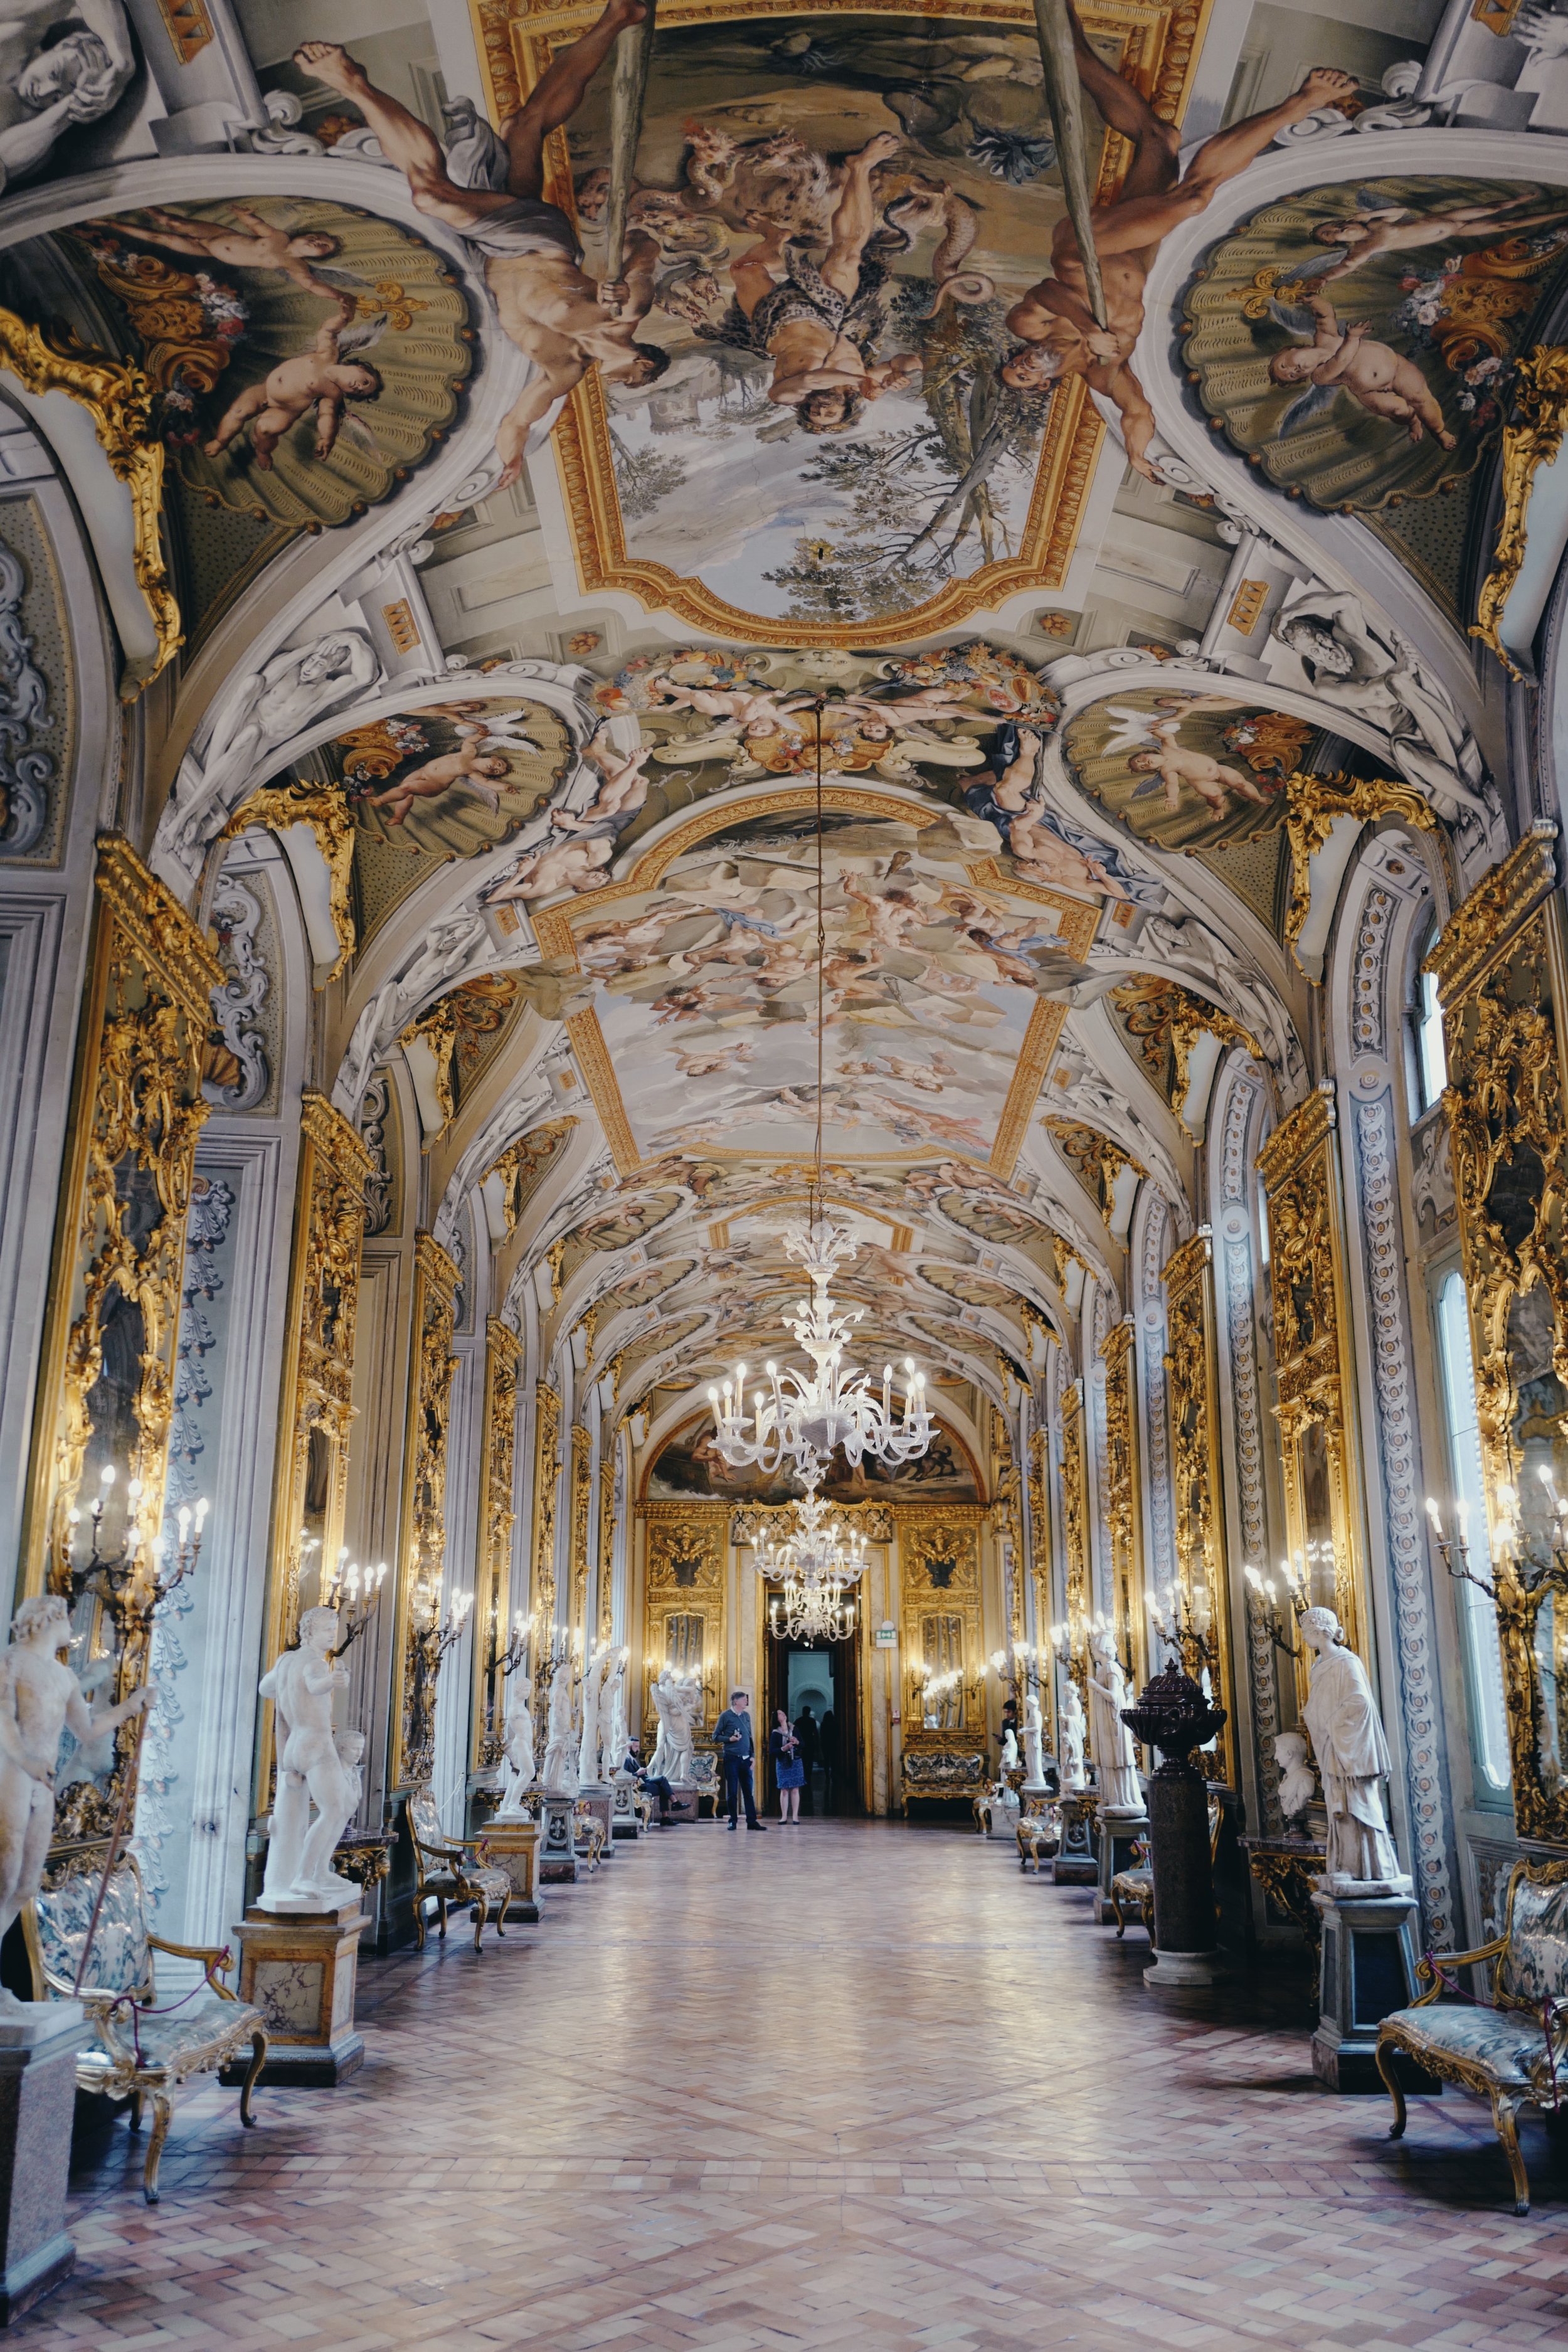 Galleria Doria Pamphilj: Gallery of Mirrors